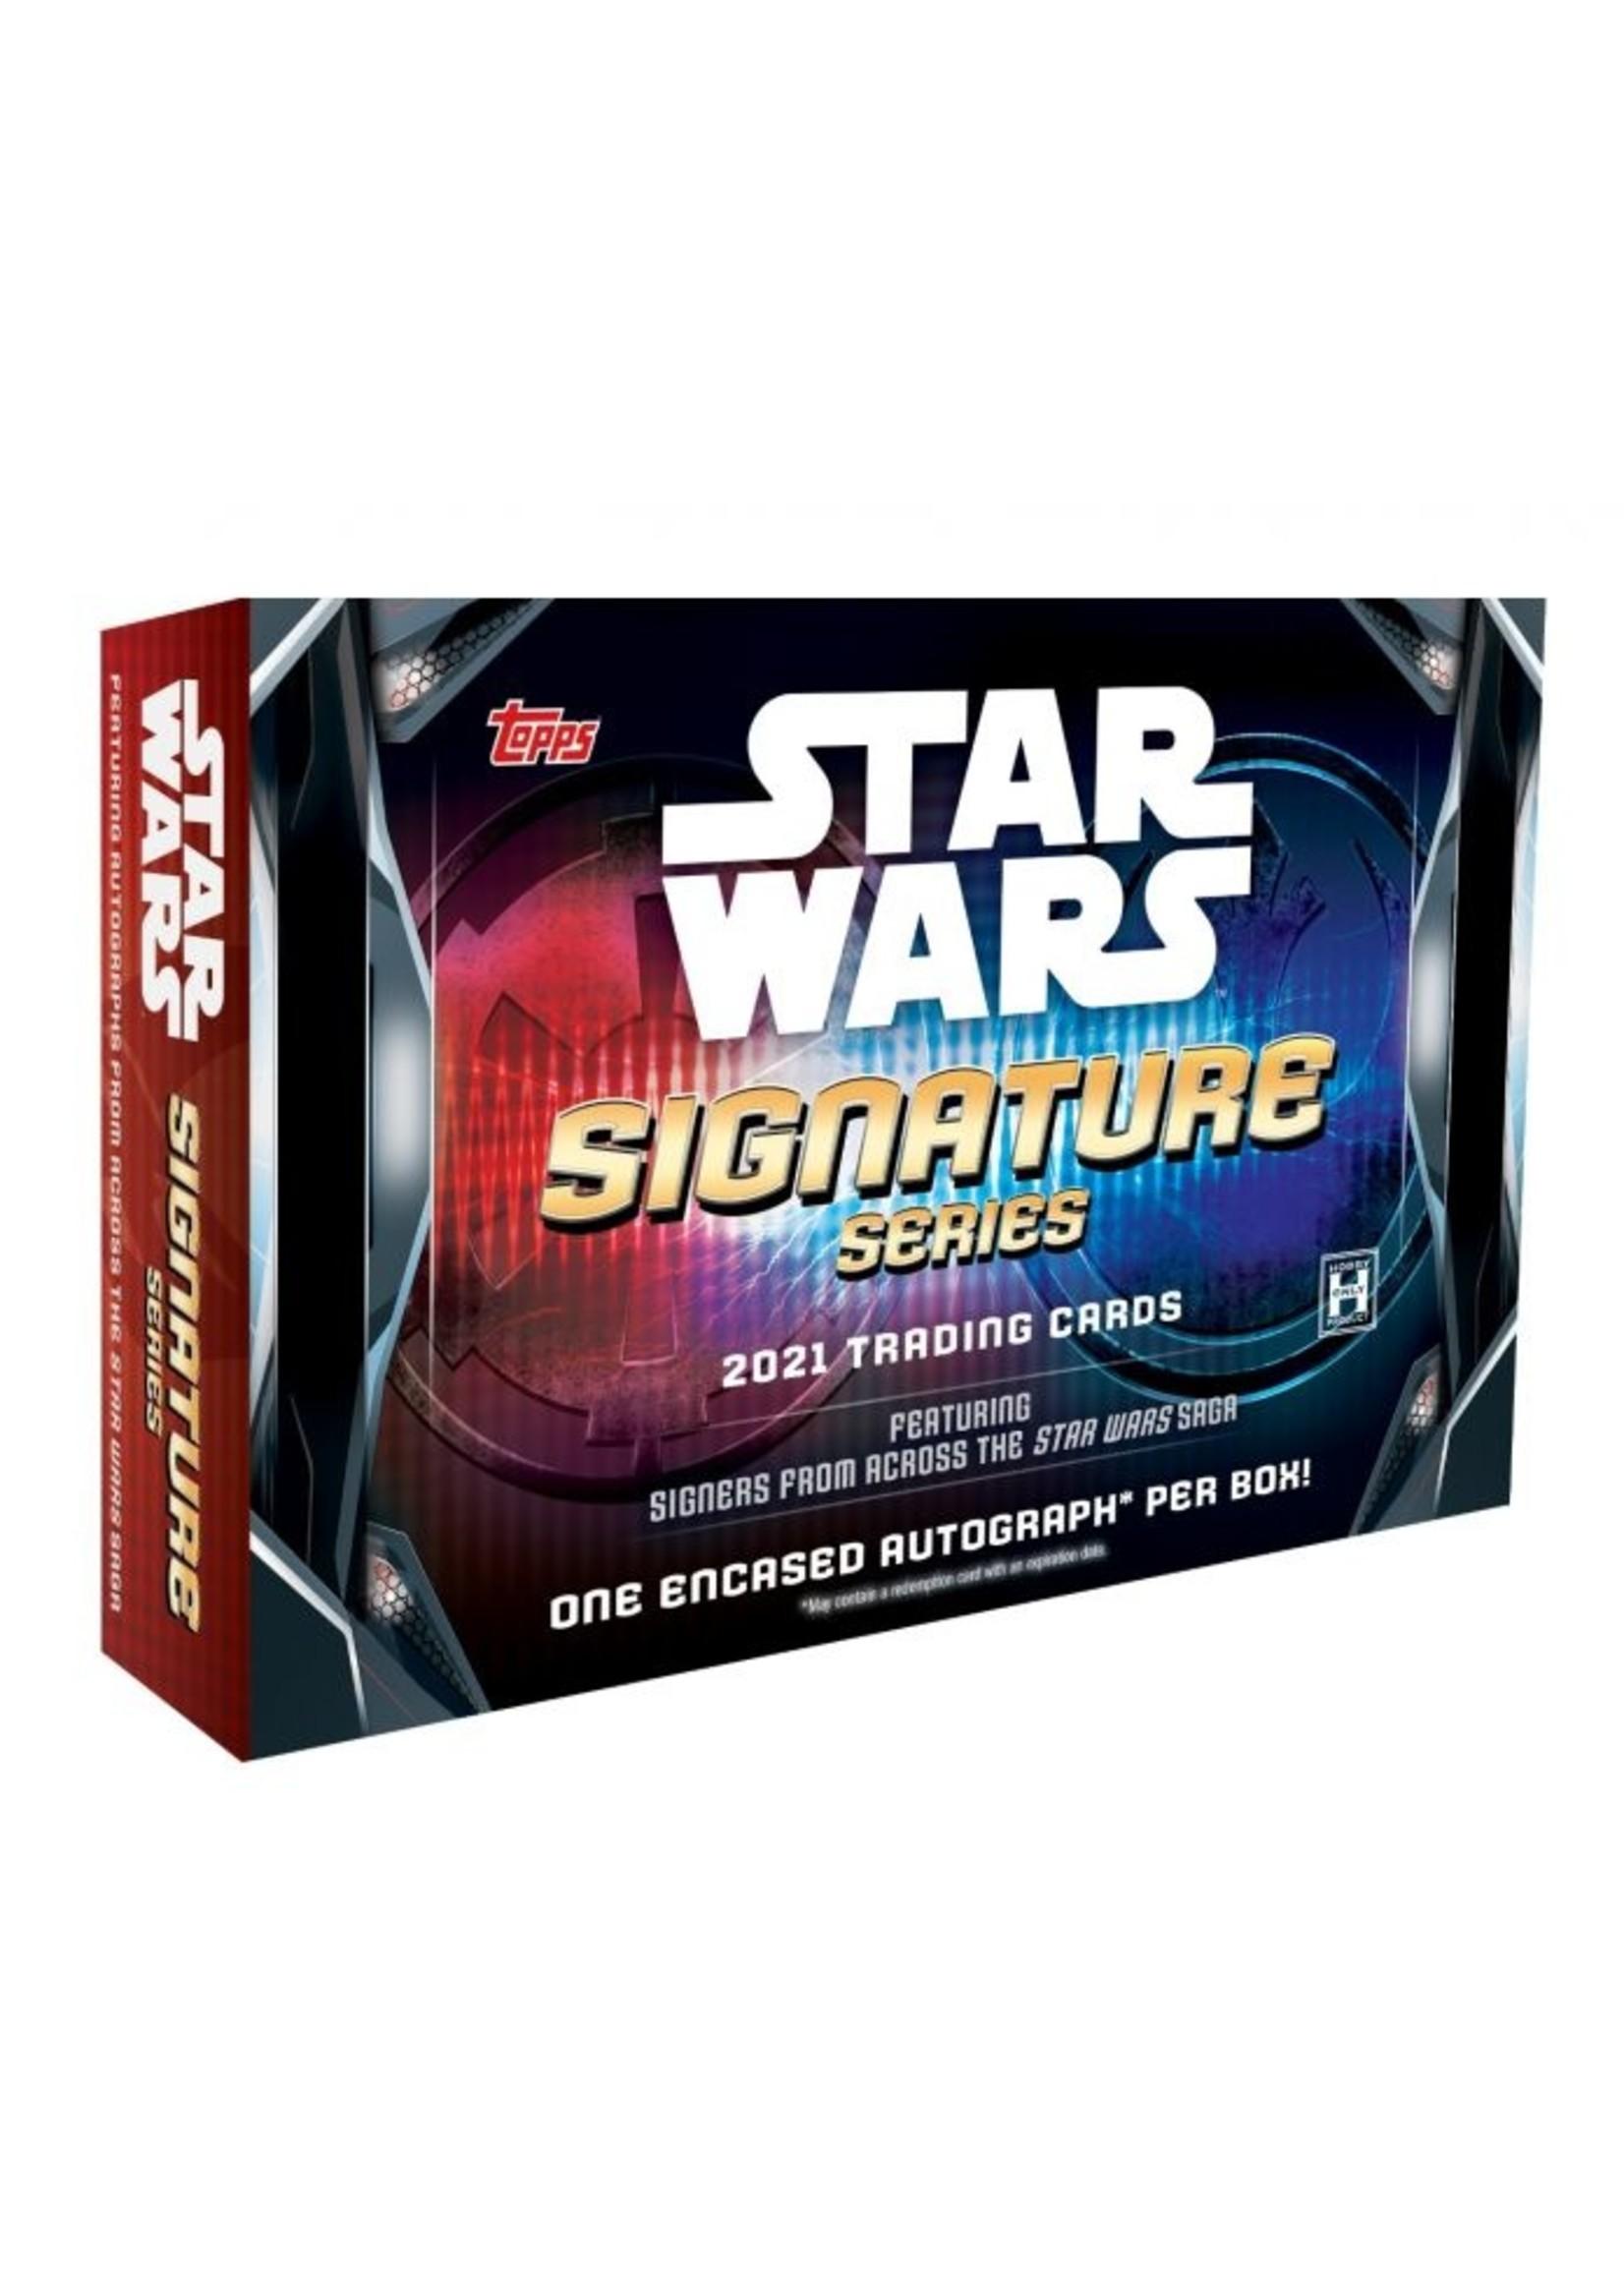 Star wars Signature Series